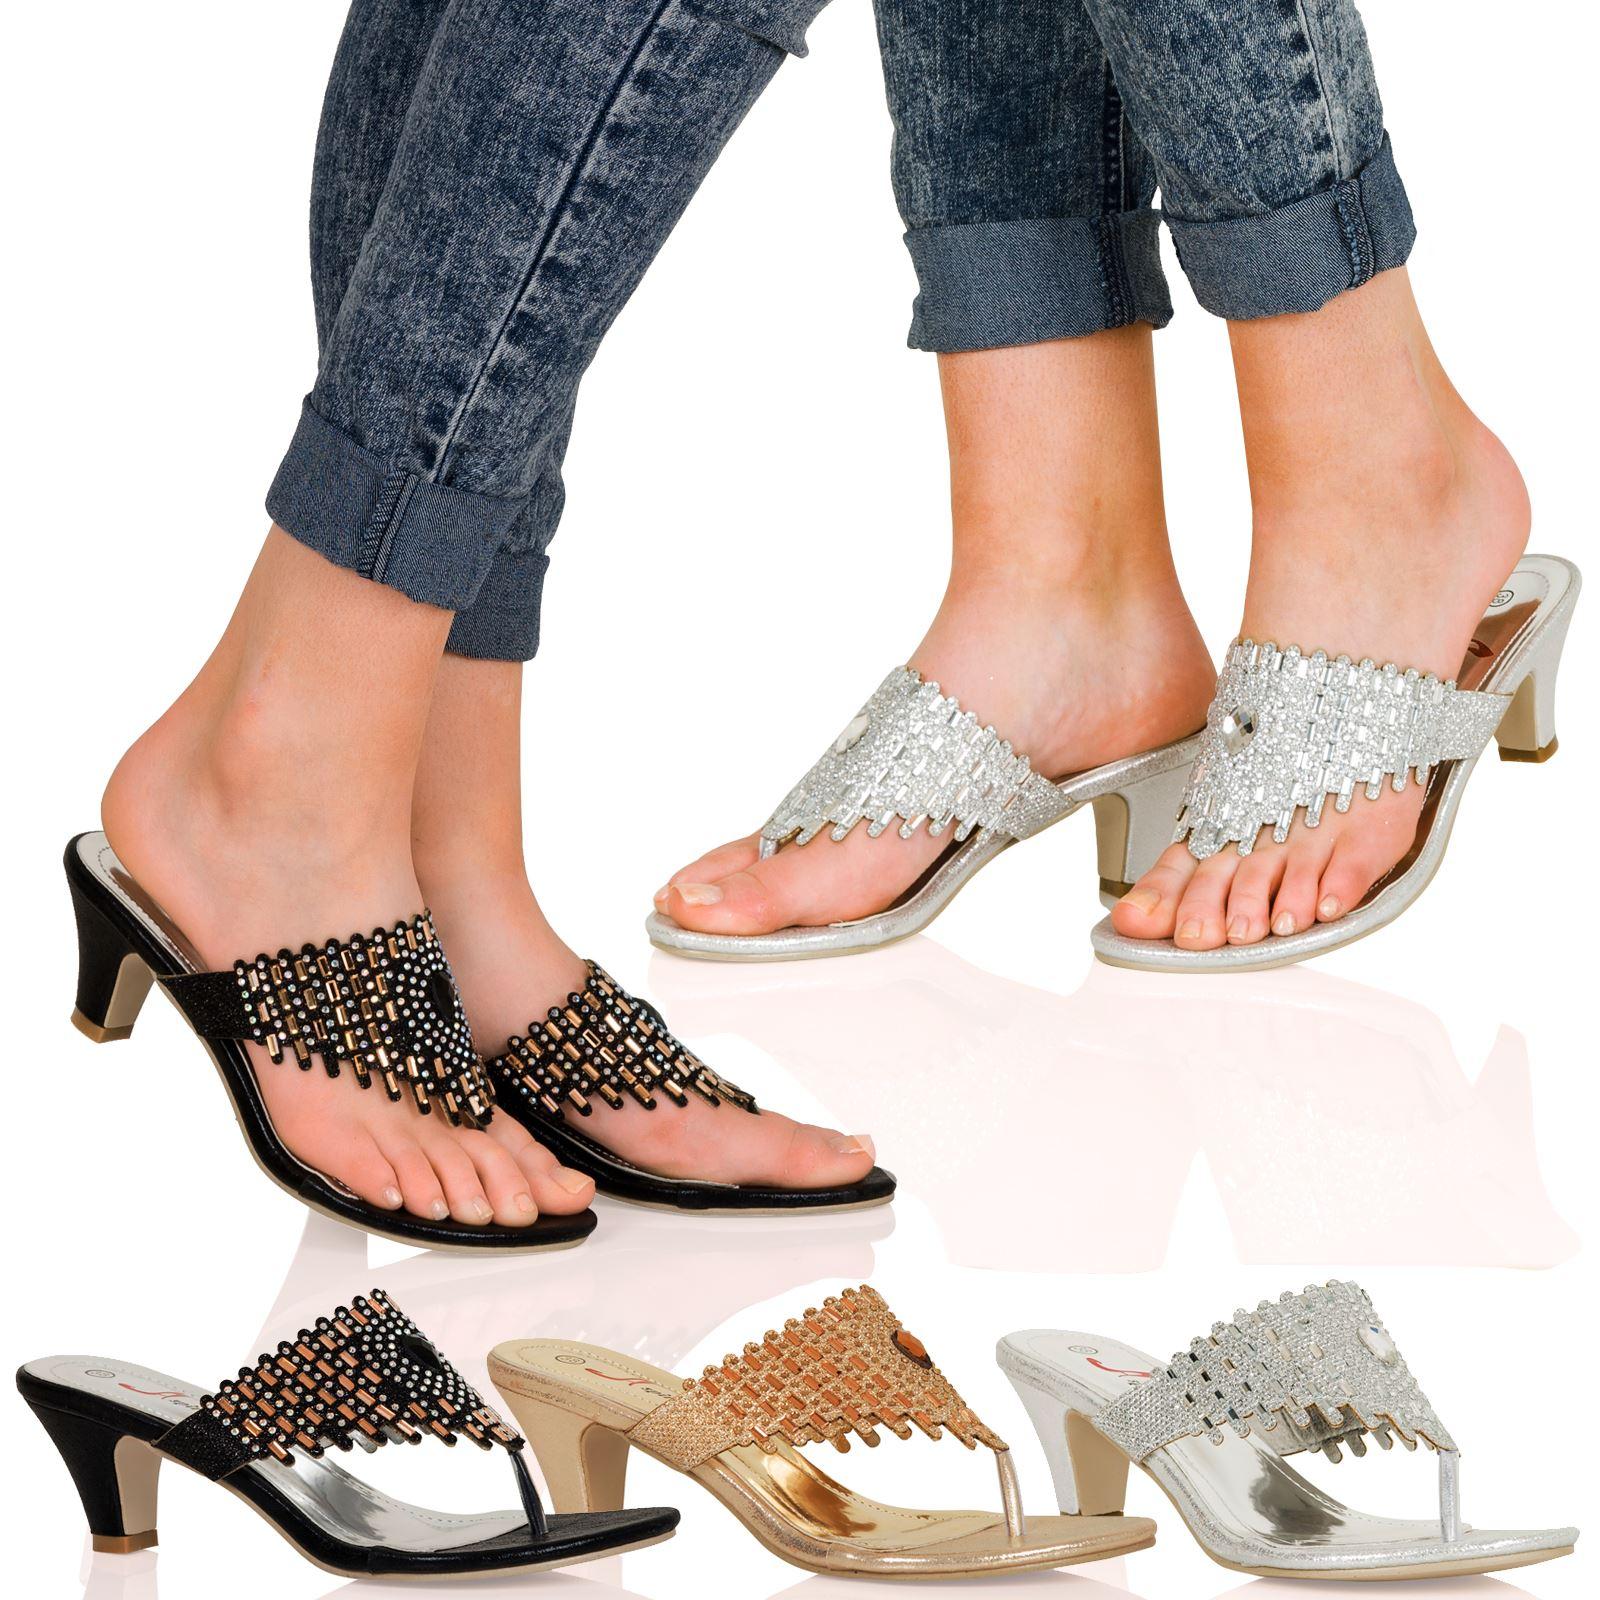 Womens sandals mid heel - Item Specifics